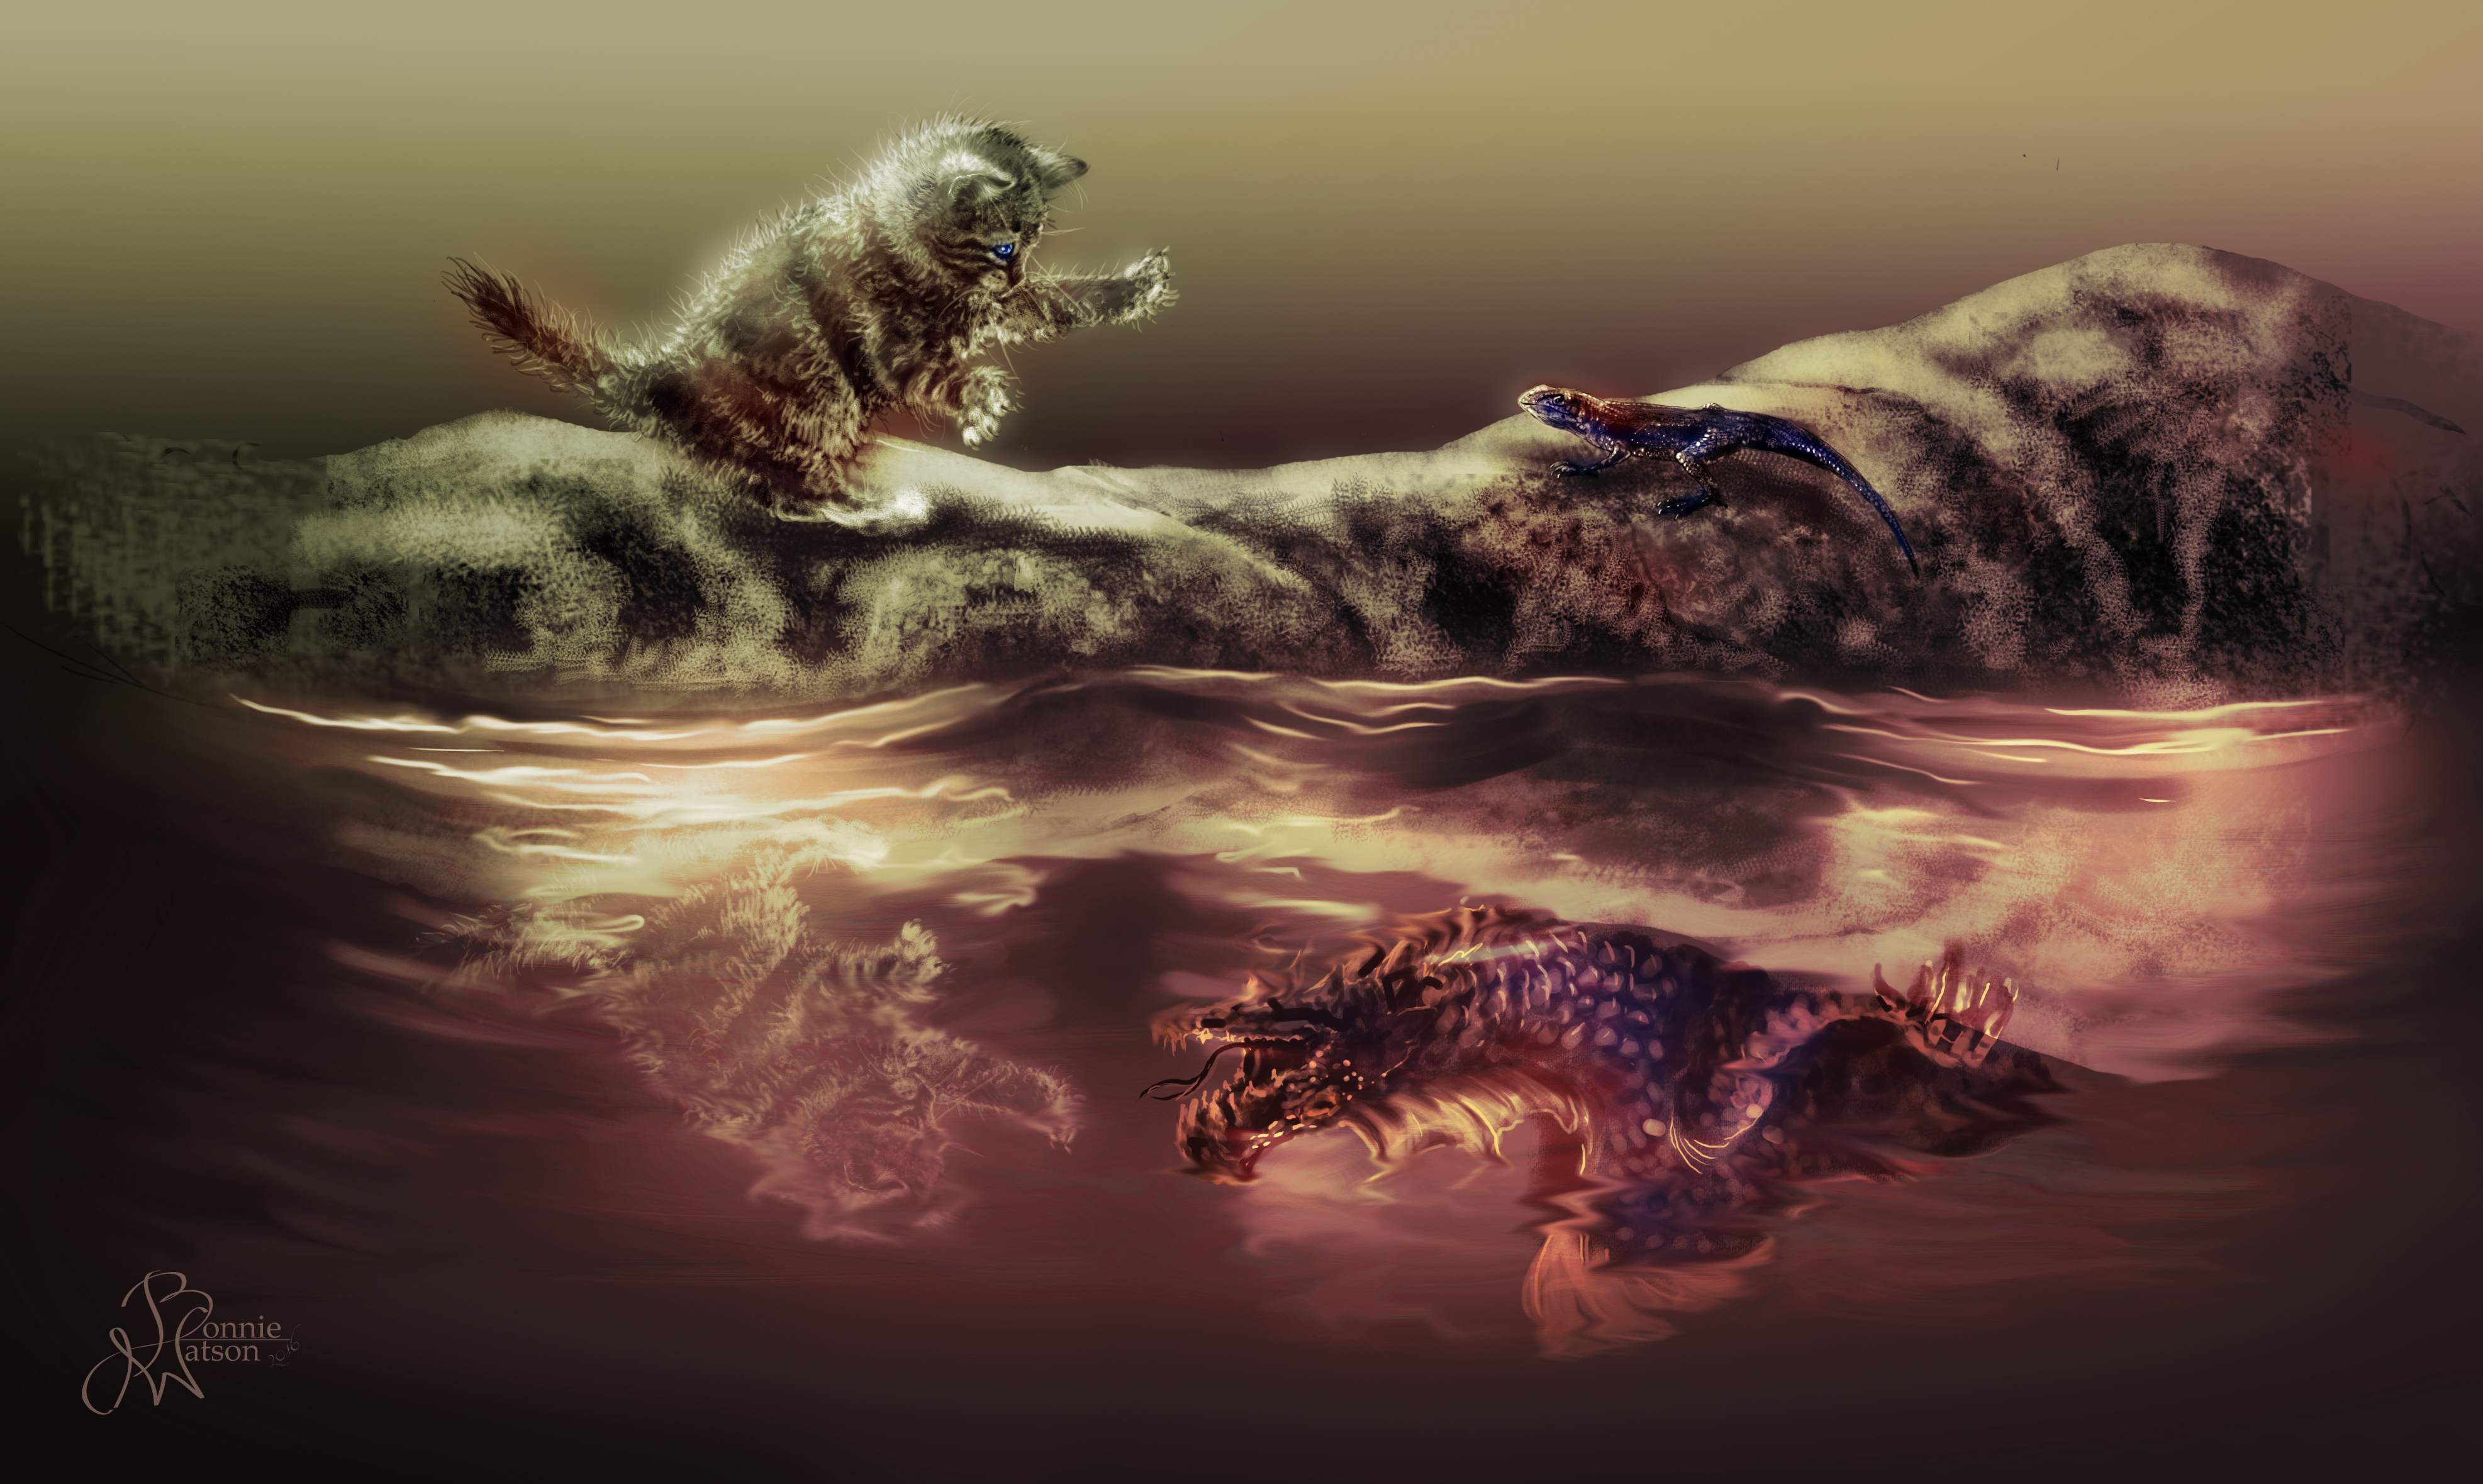 Dragon vs Kitten